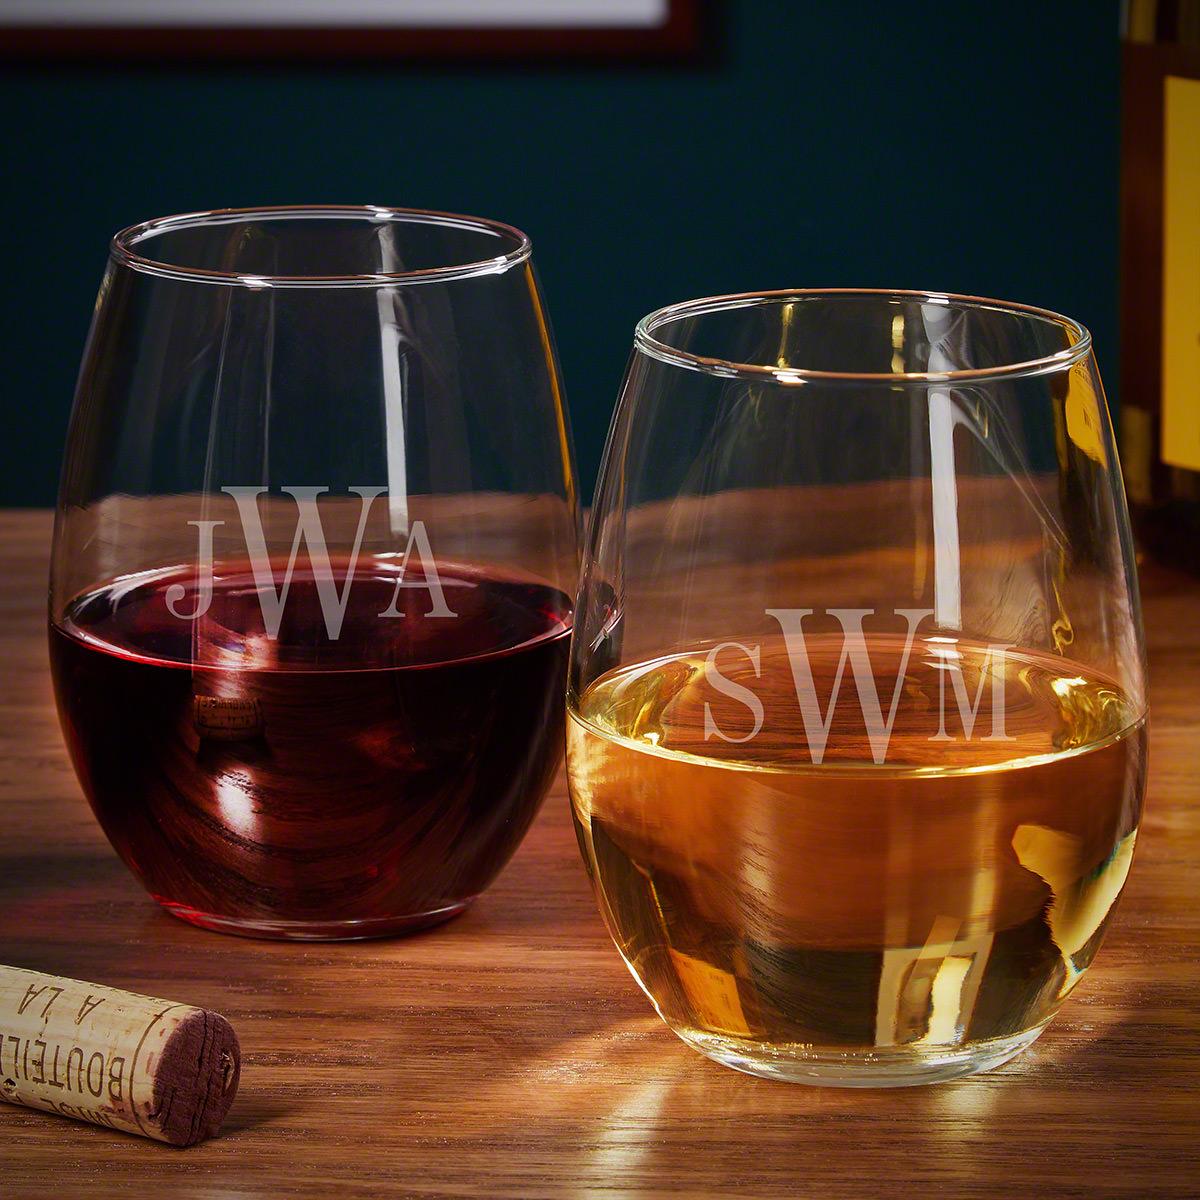 Classic Monogram Custom Wine Glasses Gift Ideas for Couples